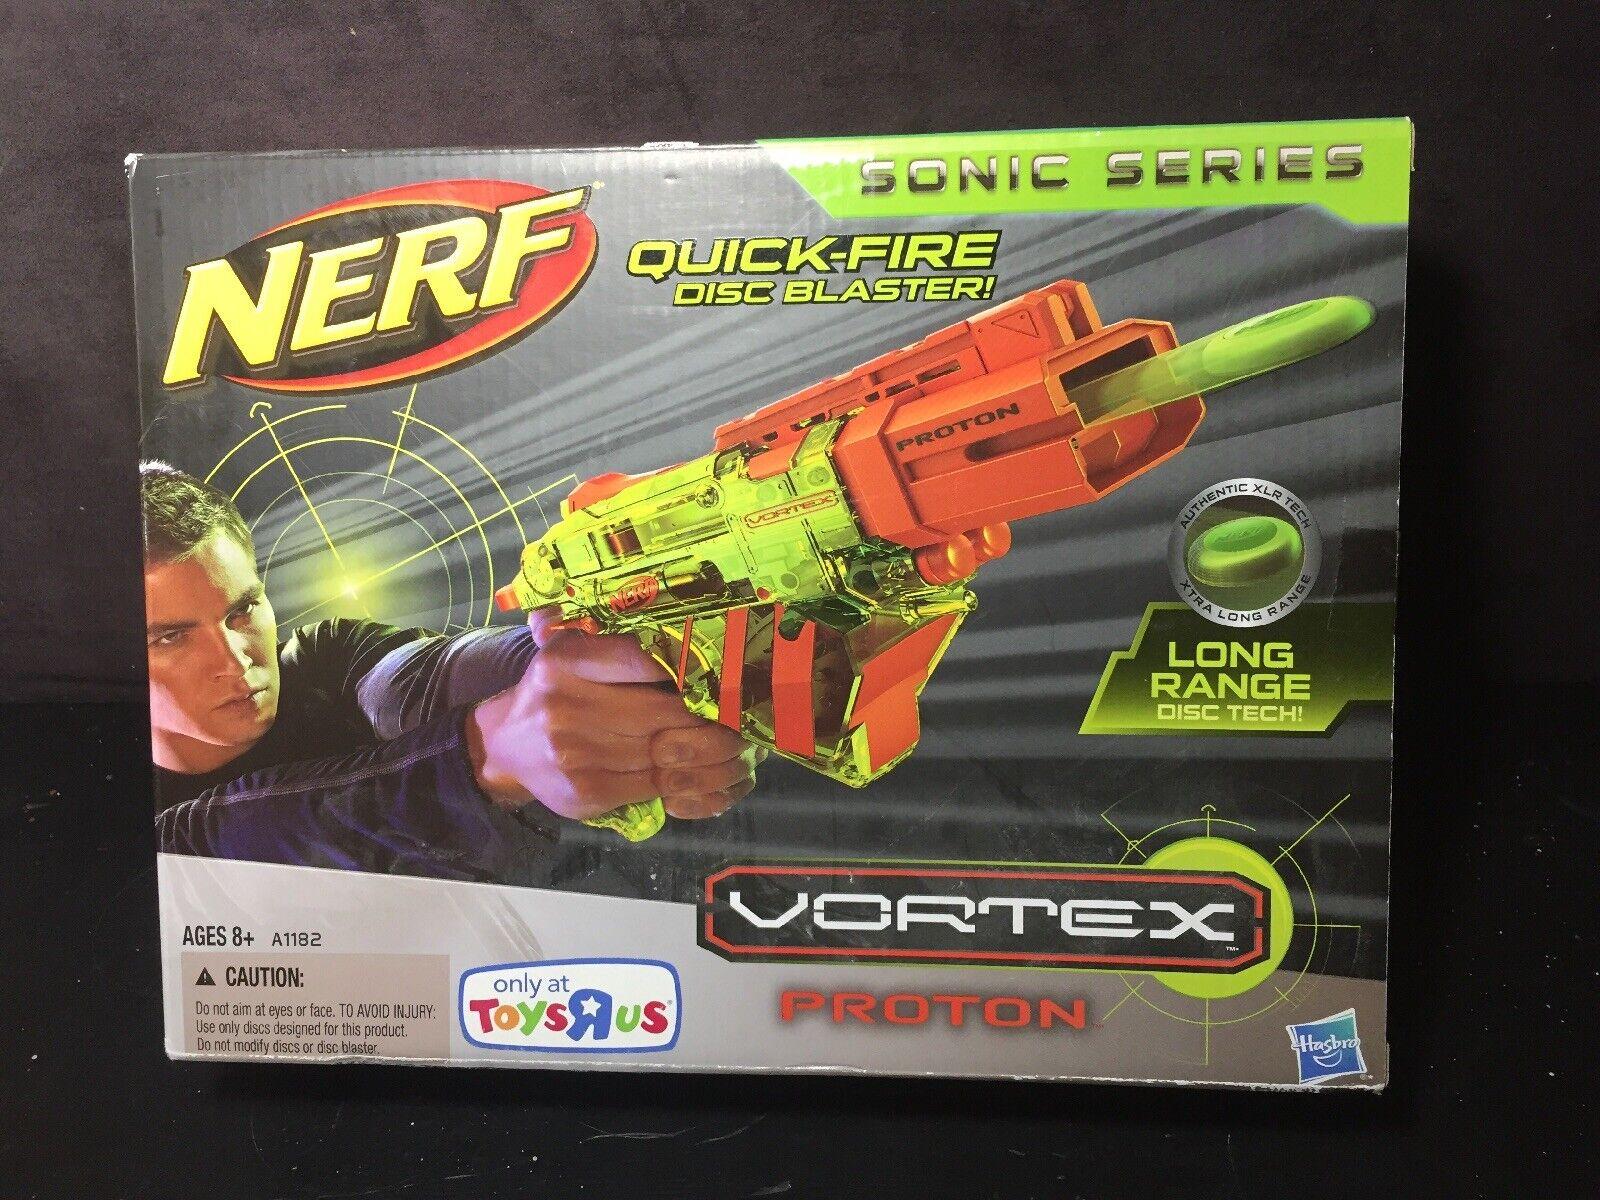 Nerf Nerf Nerf Sonic Series Vortex Predon Disc Blaster 1ca5cd